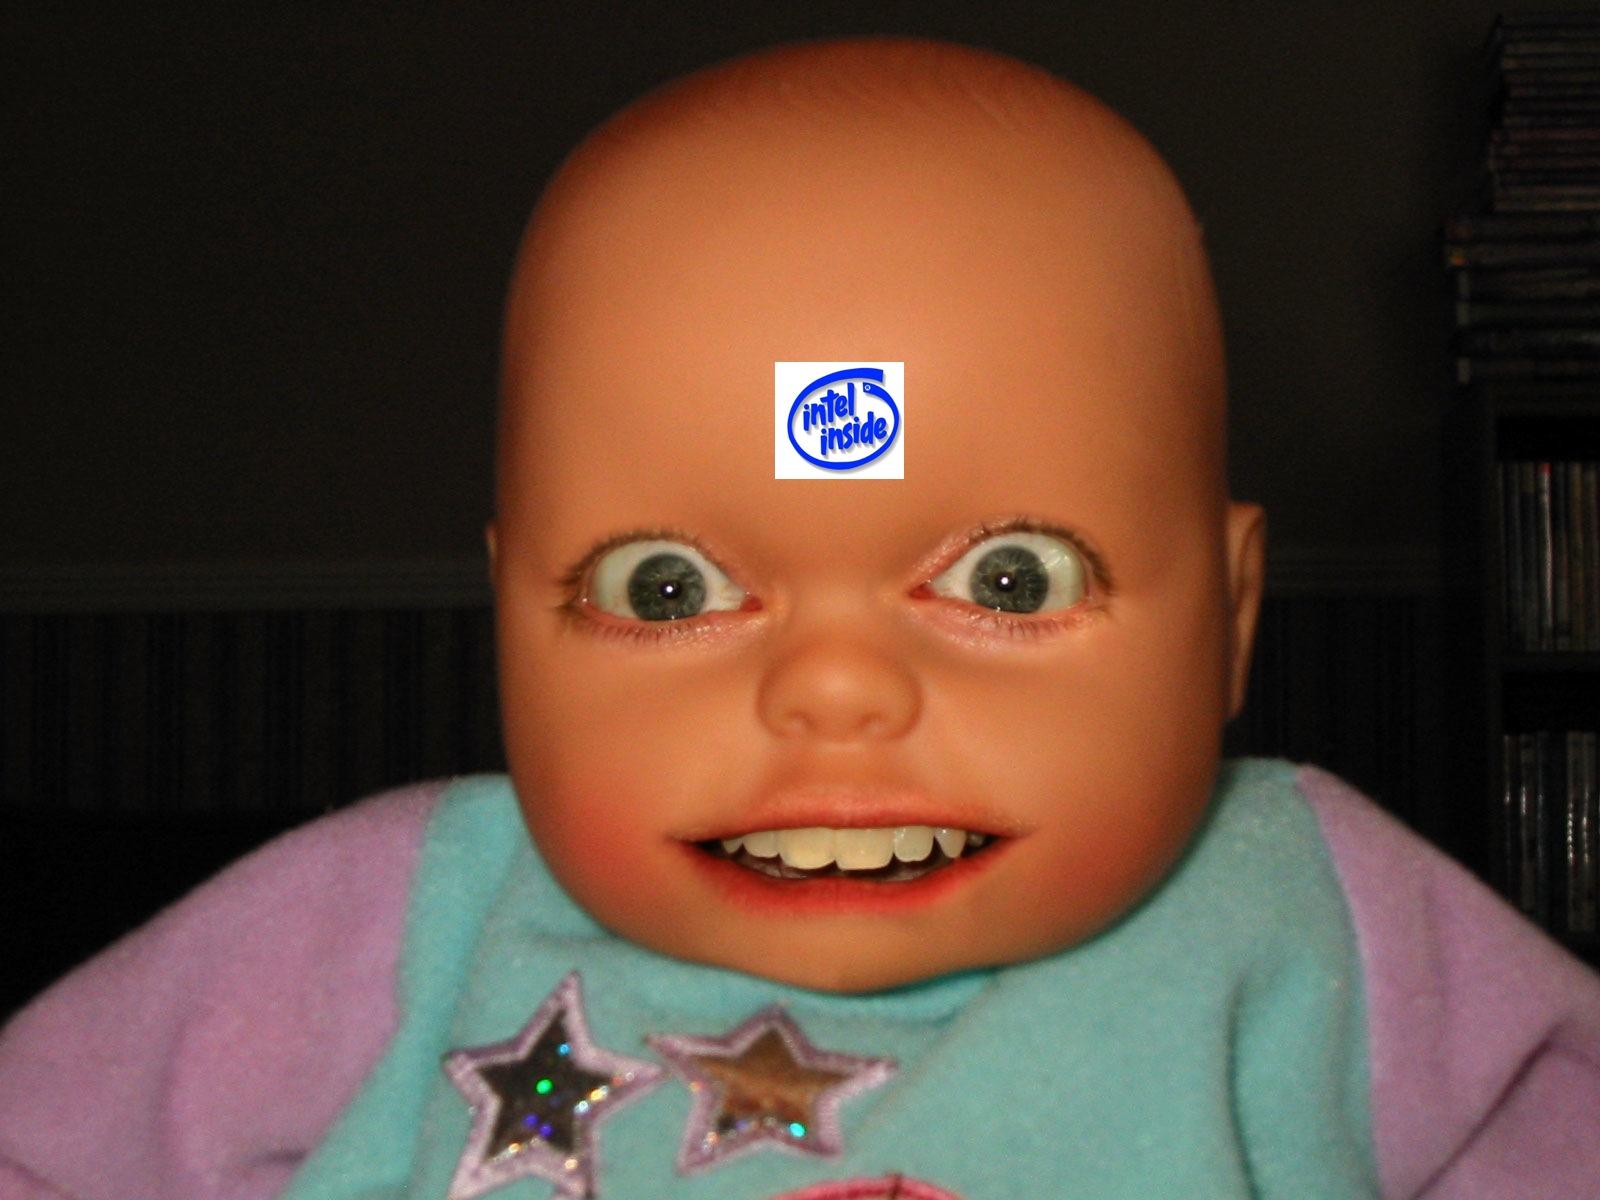 baby bad baby bad Defective Child